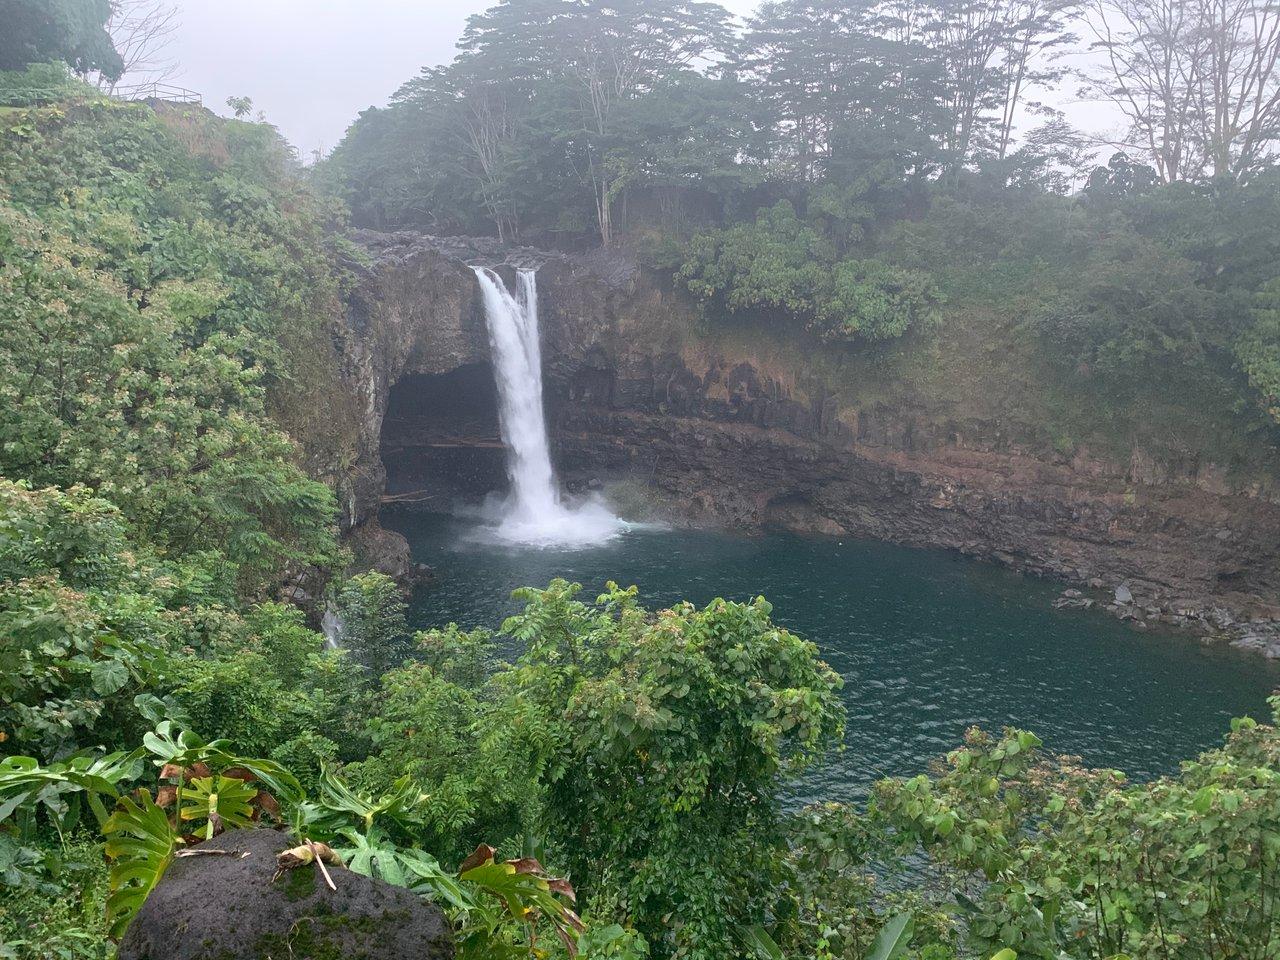 Flash back pics of waterfalls